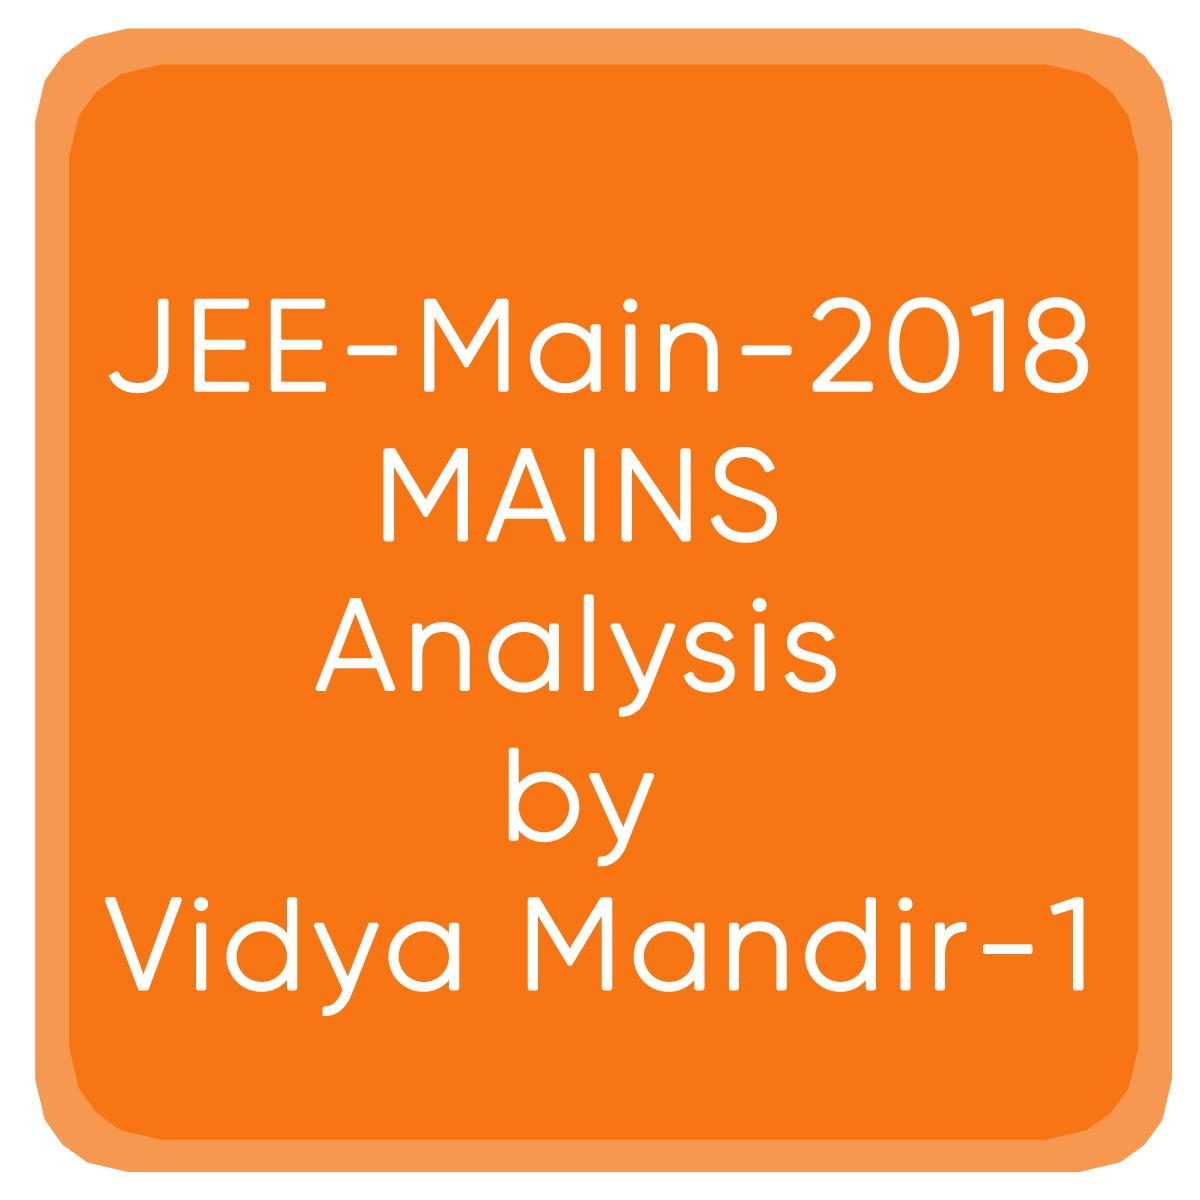 JEE-Main-2018-MAINS Analysis by Vidya Mandir-1